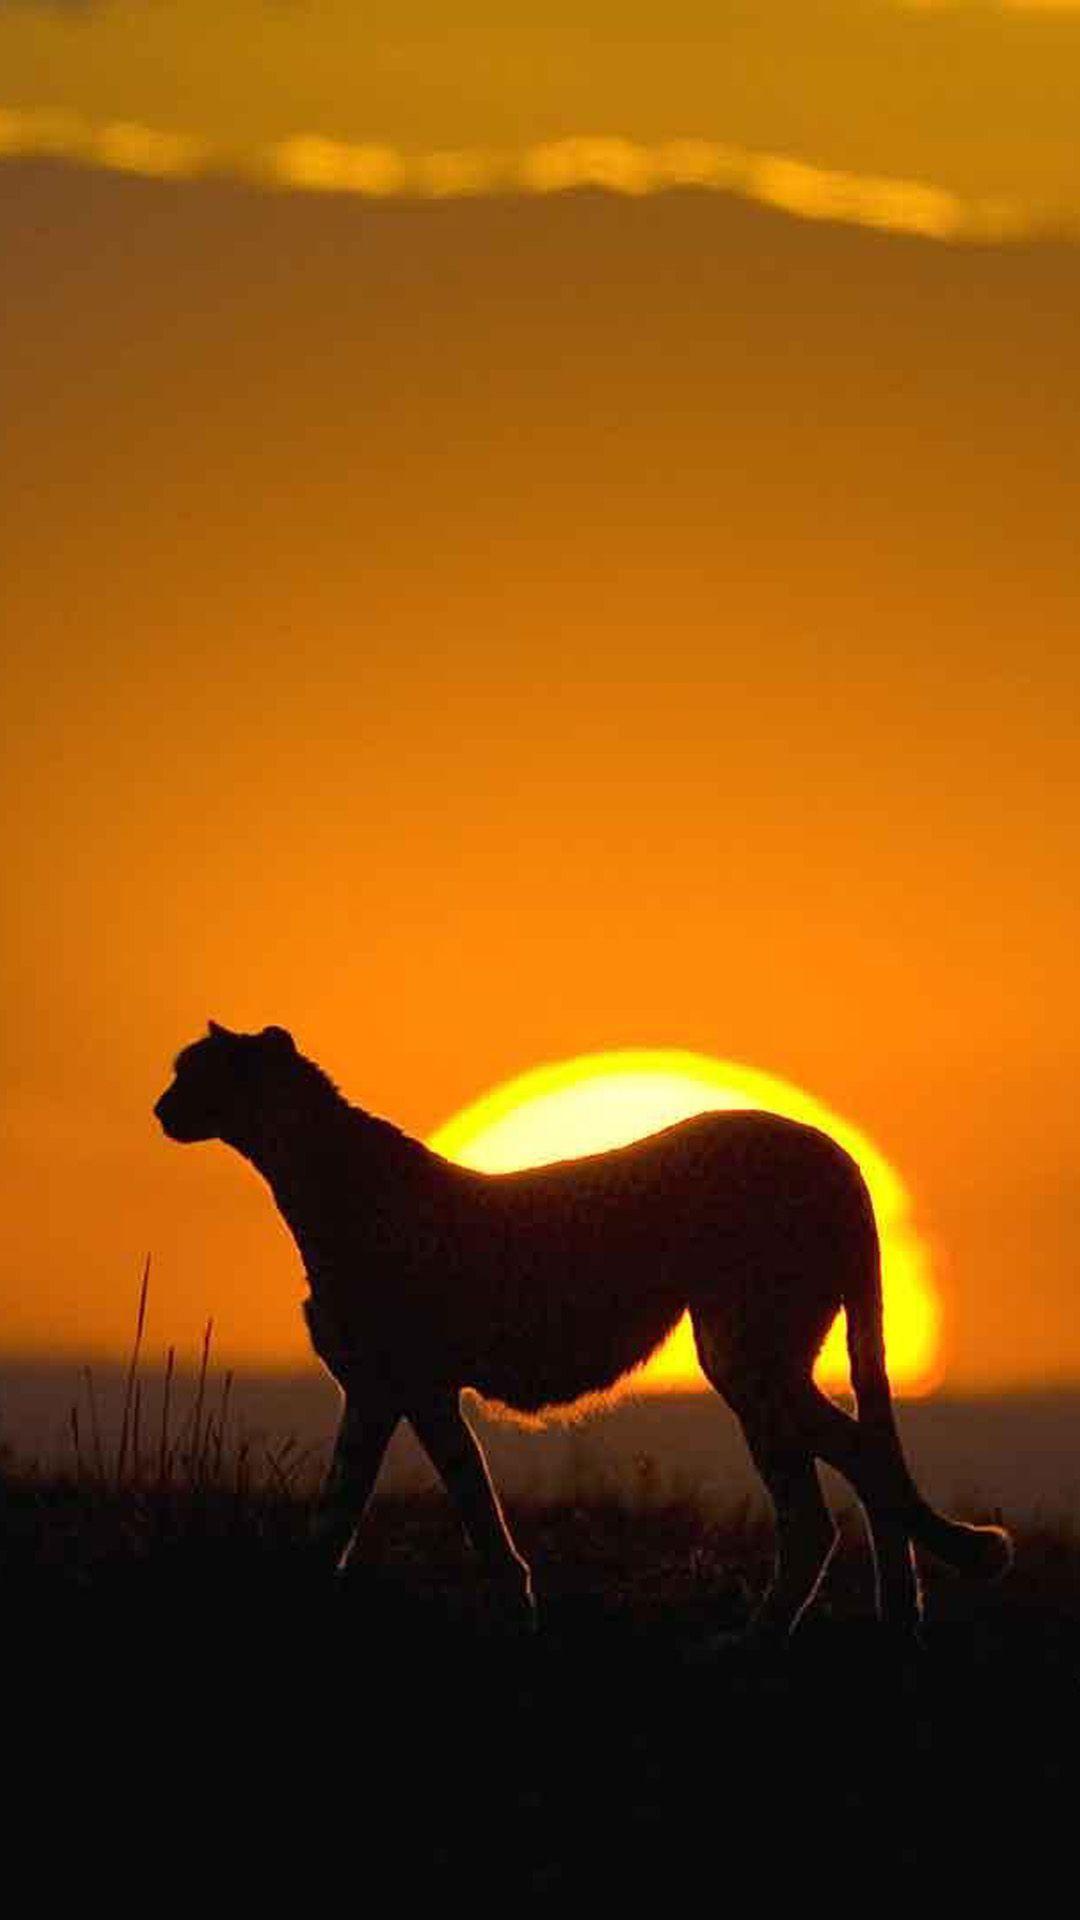 African leopard sunset grassland landscape iphone 6